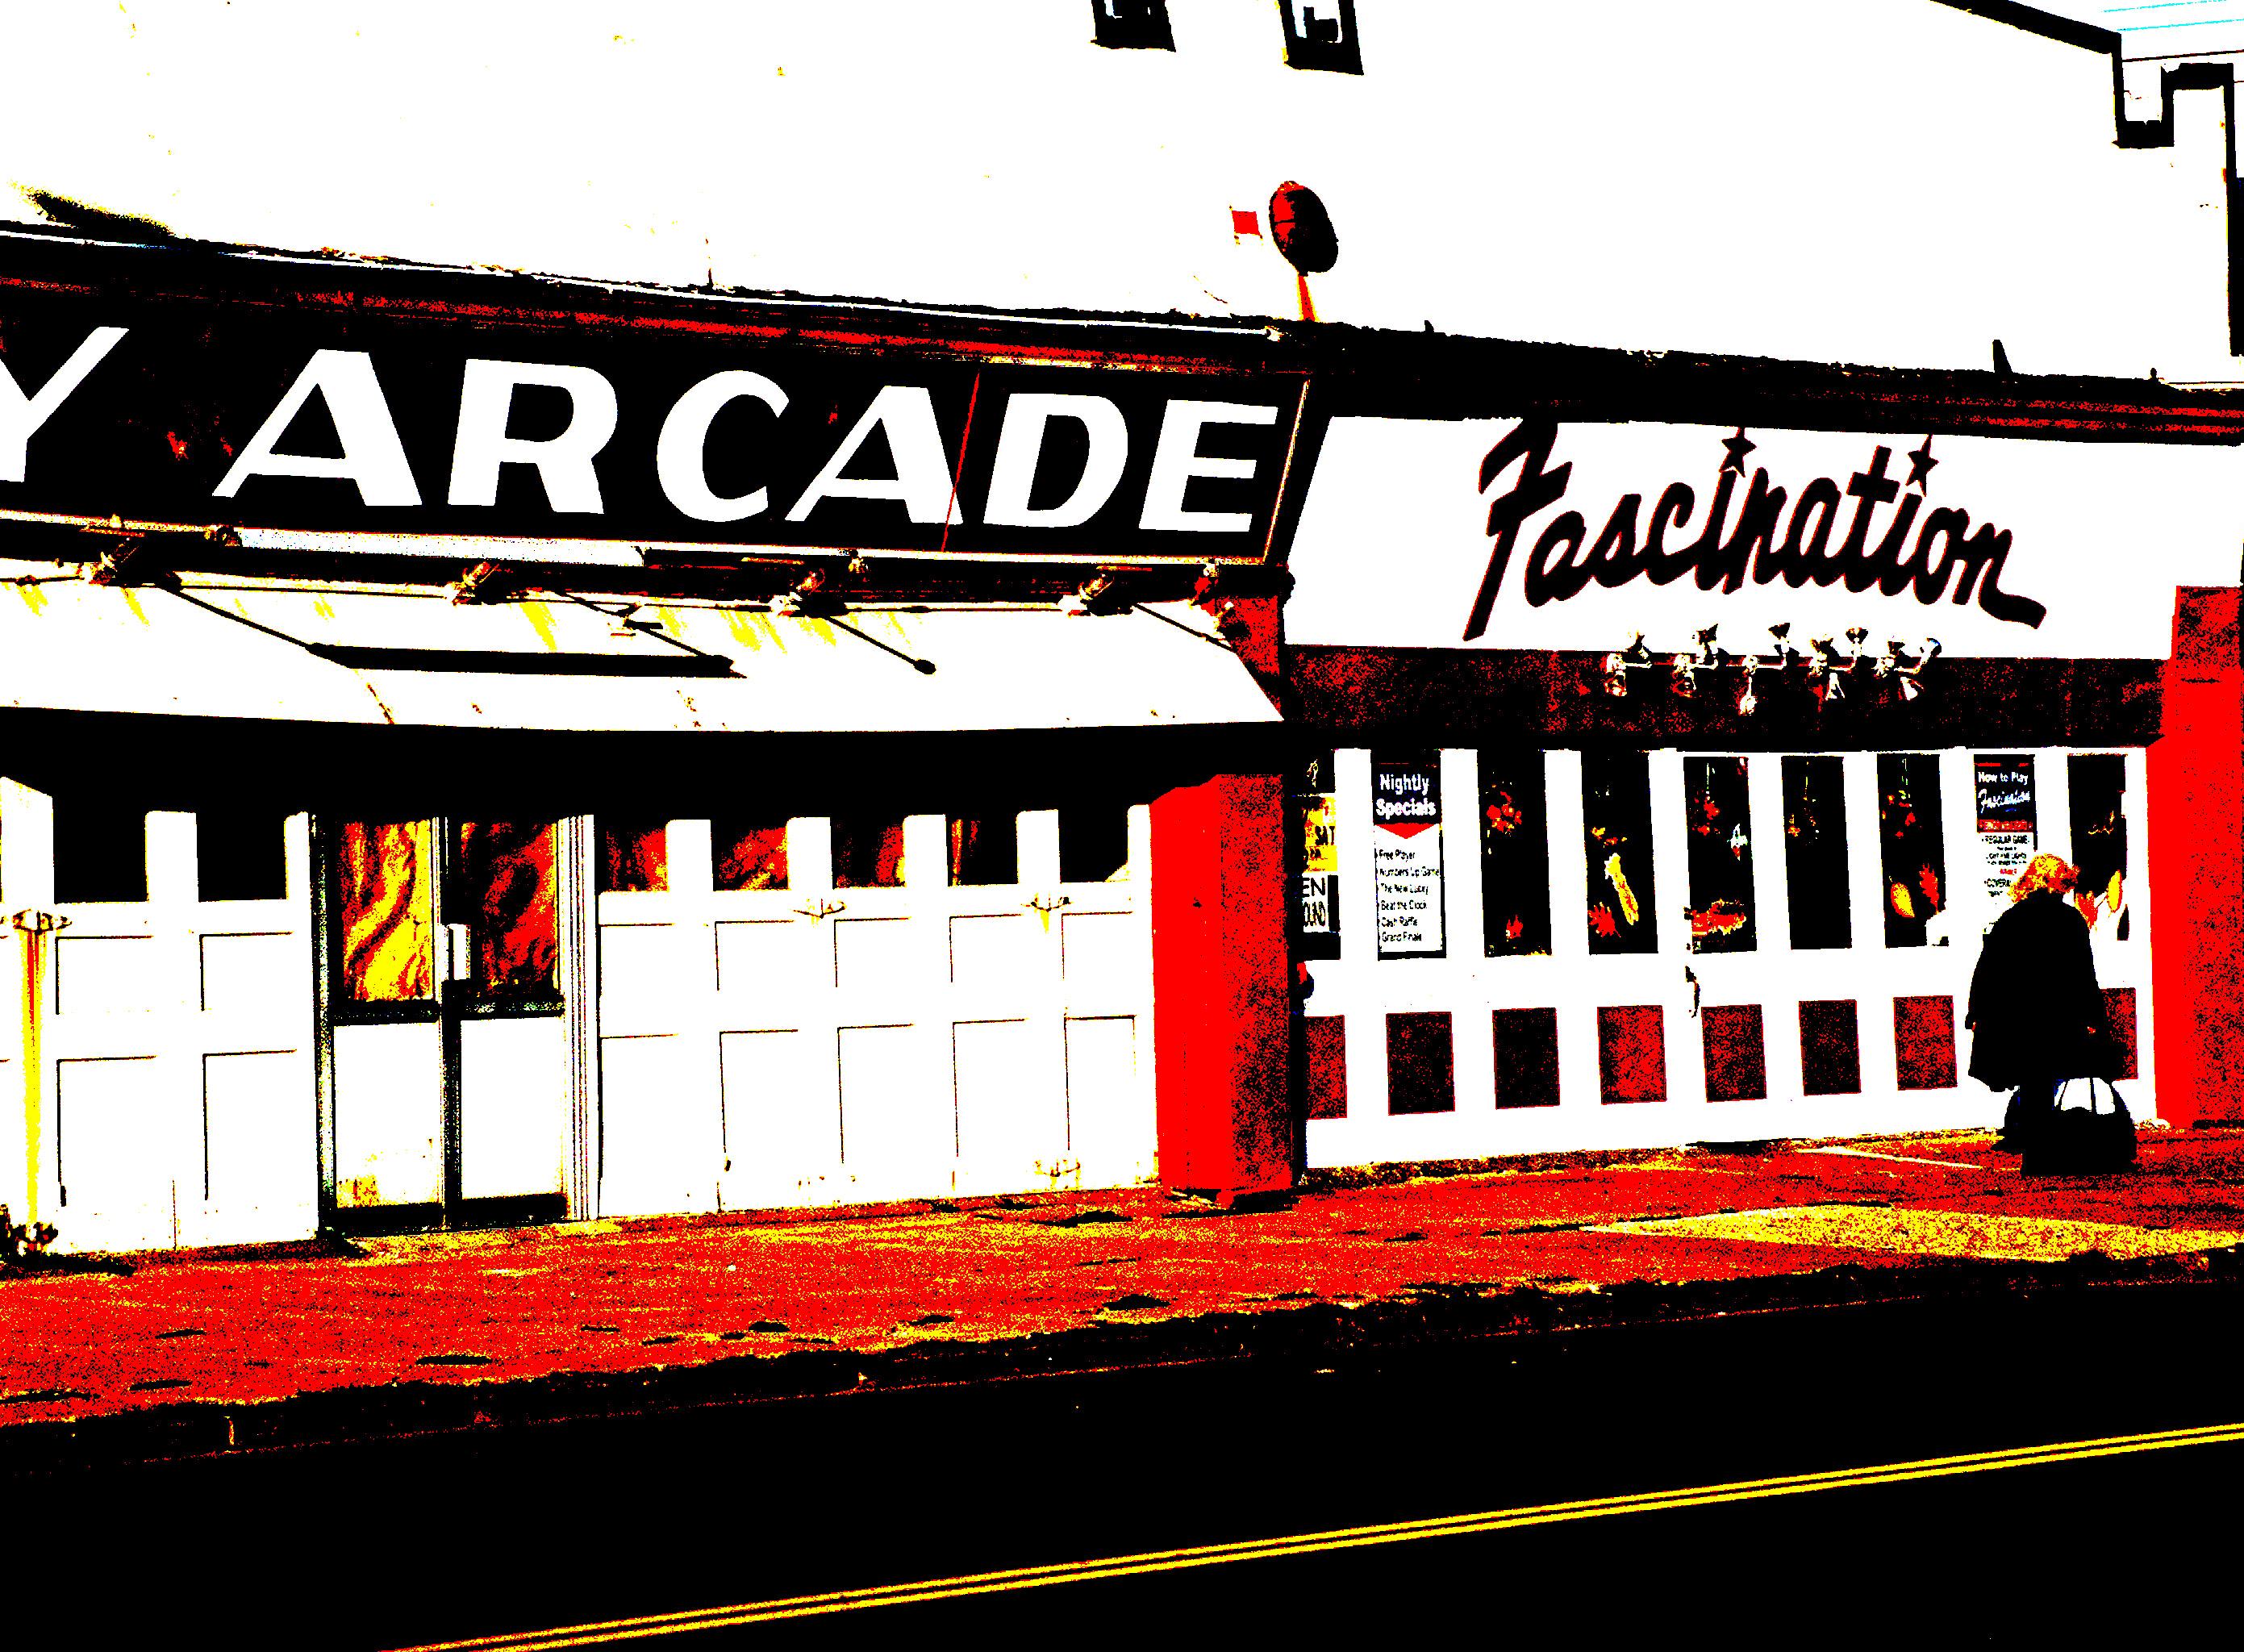 arcadewomancmyk2